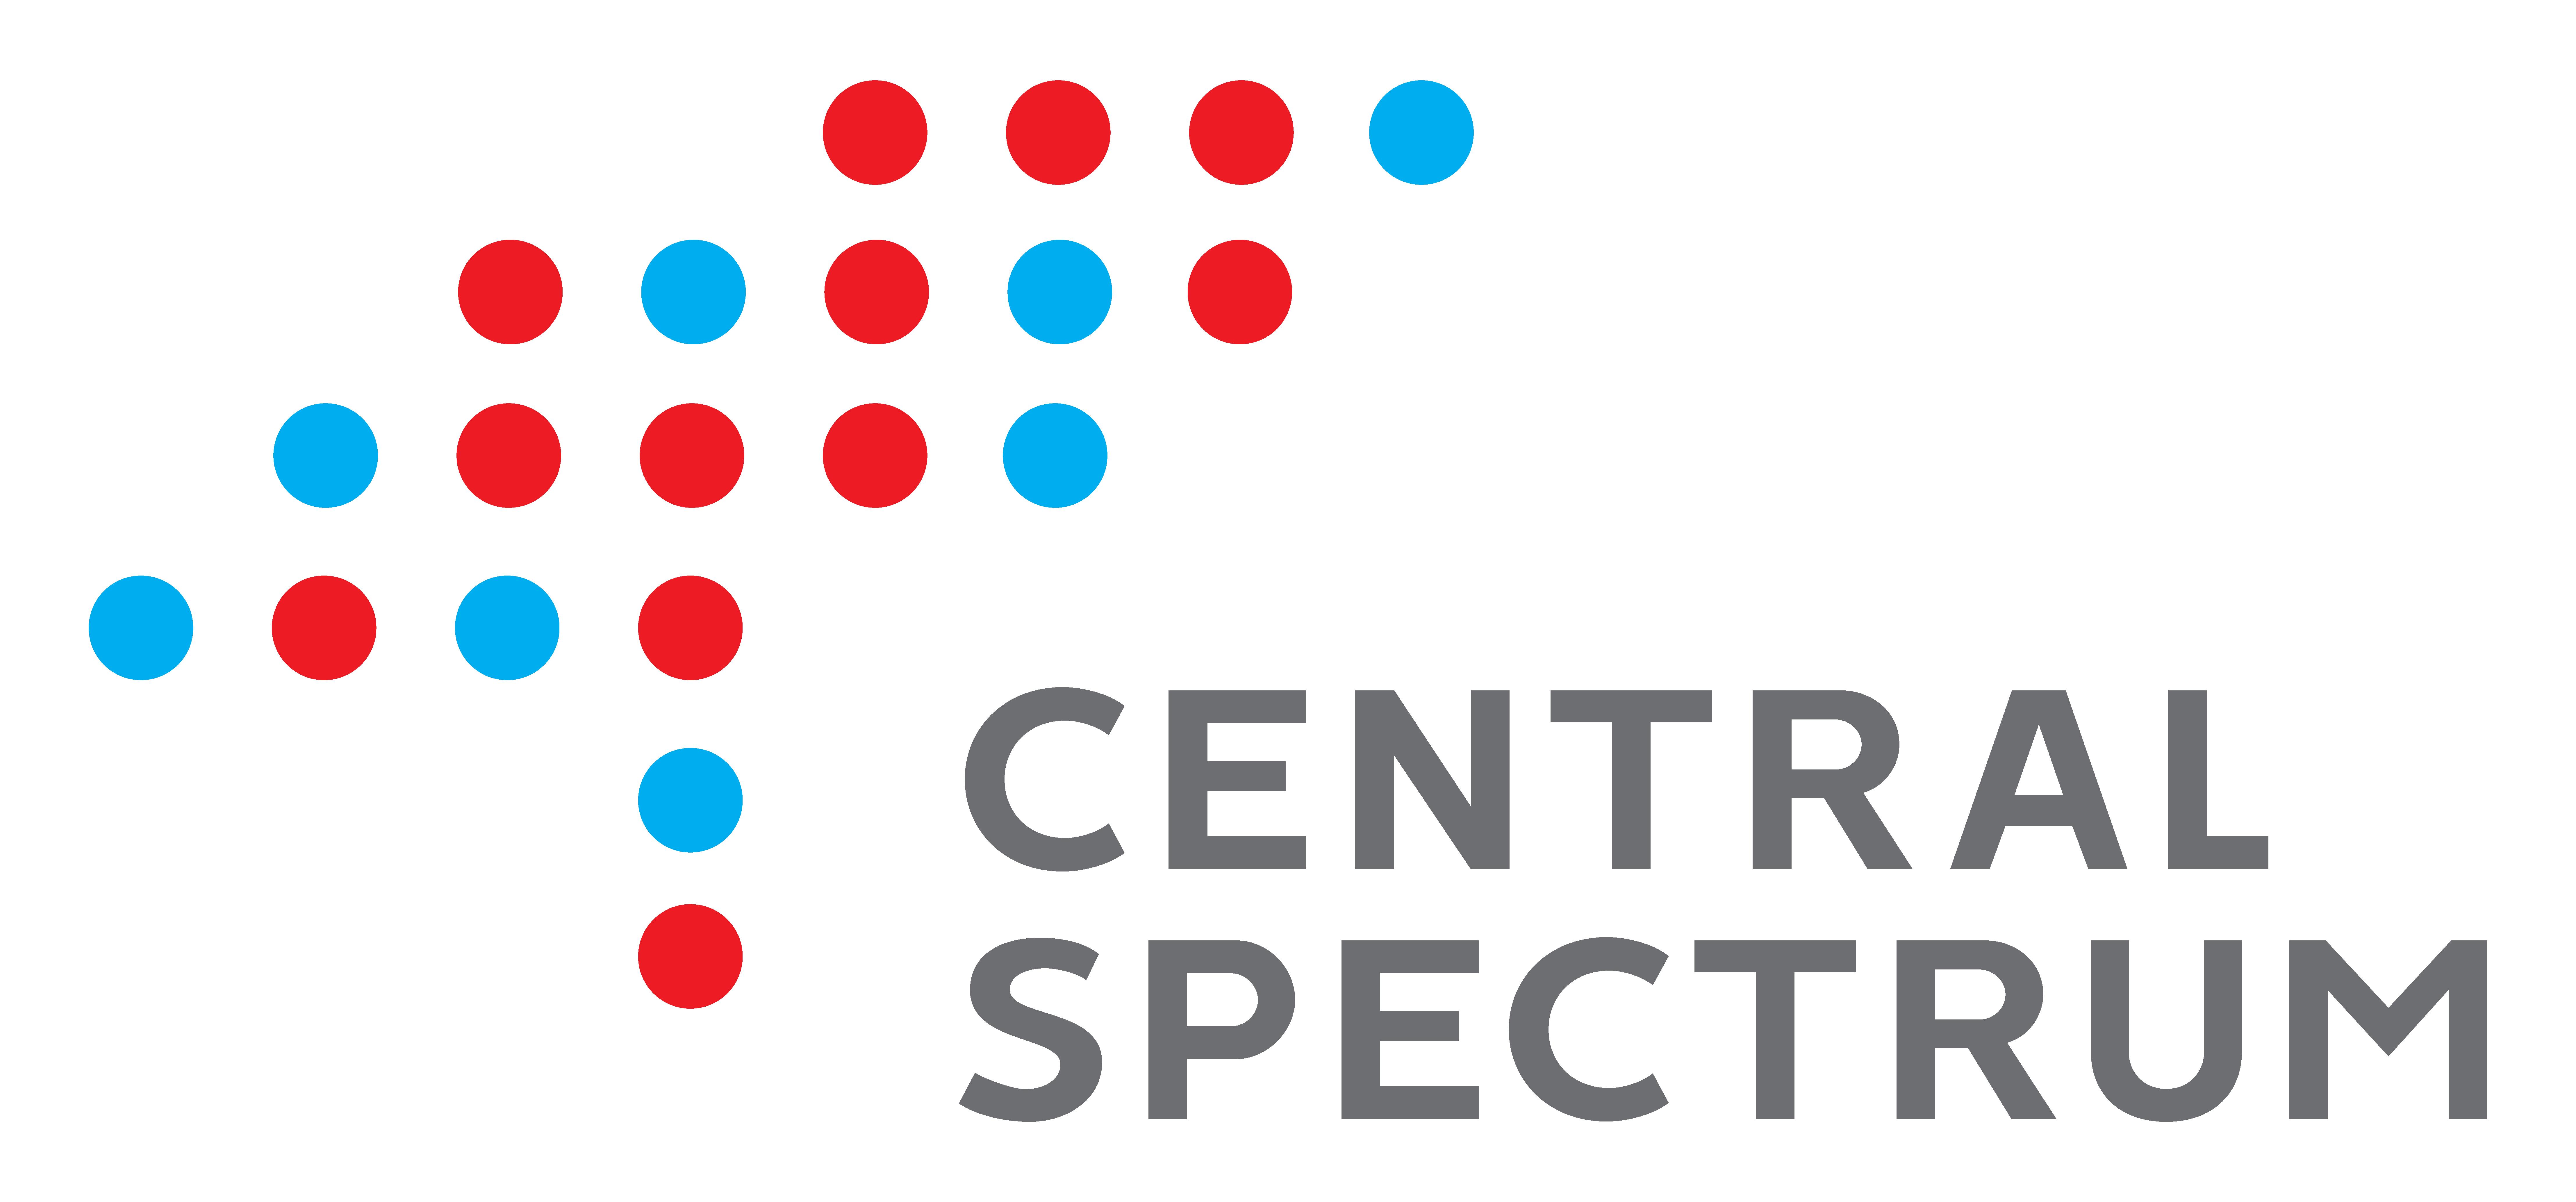 Central Spectrum (M) Sdn Bhd